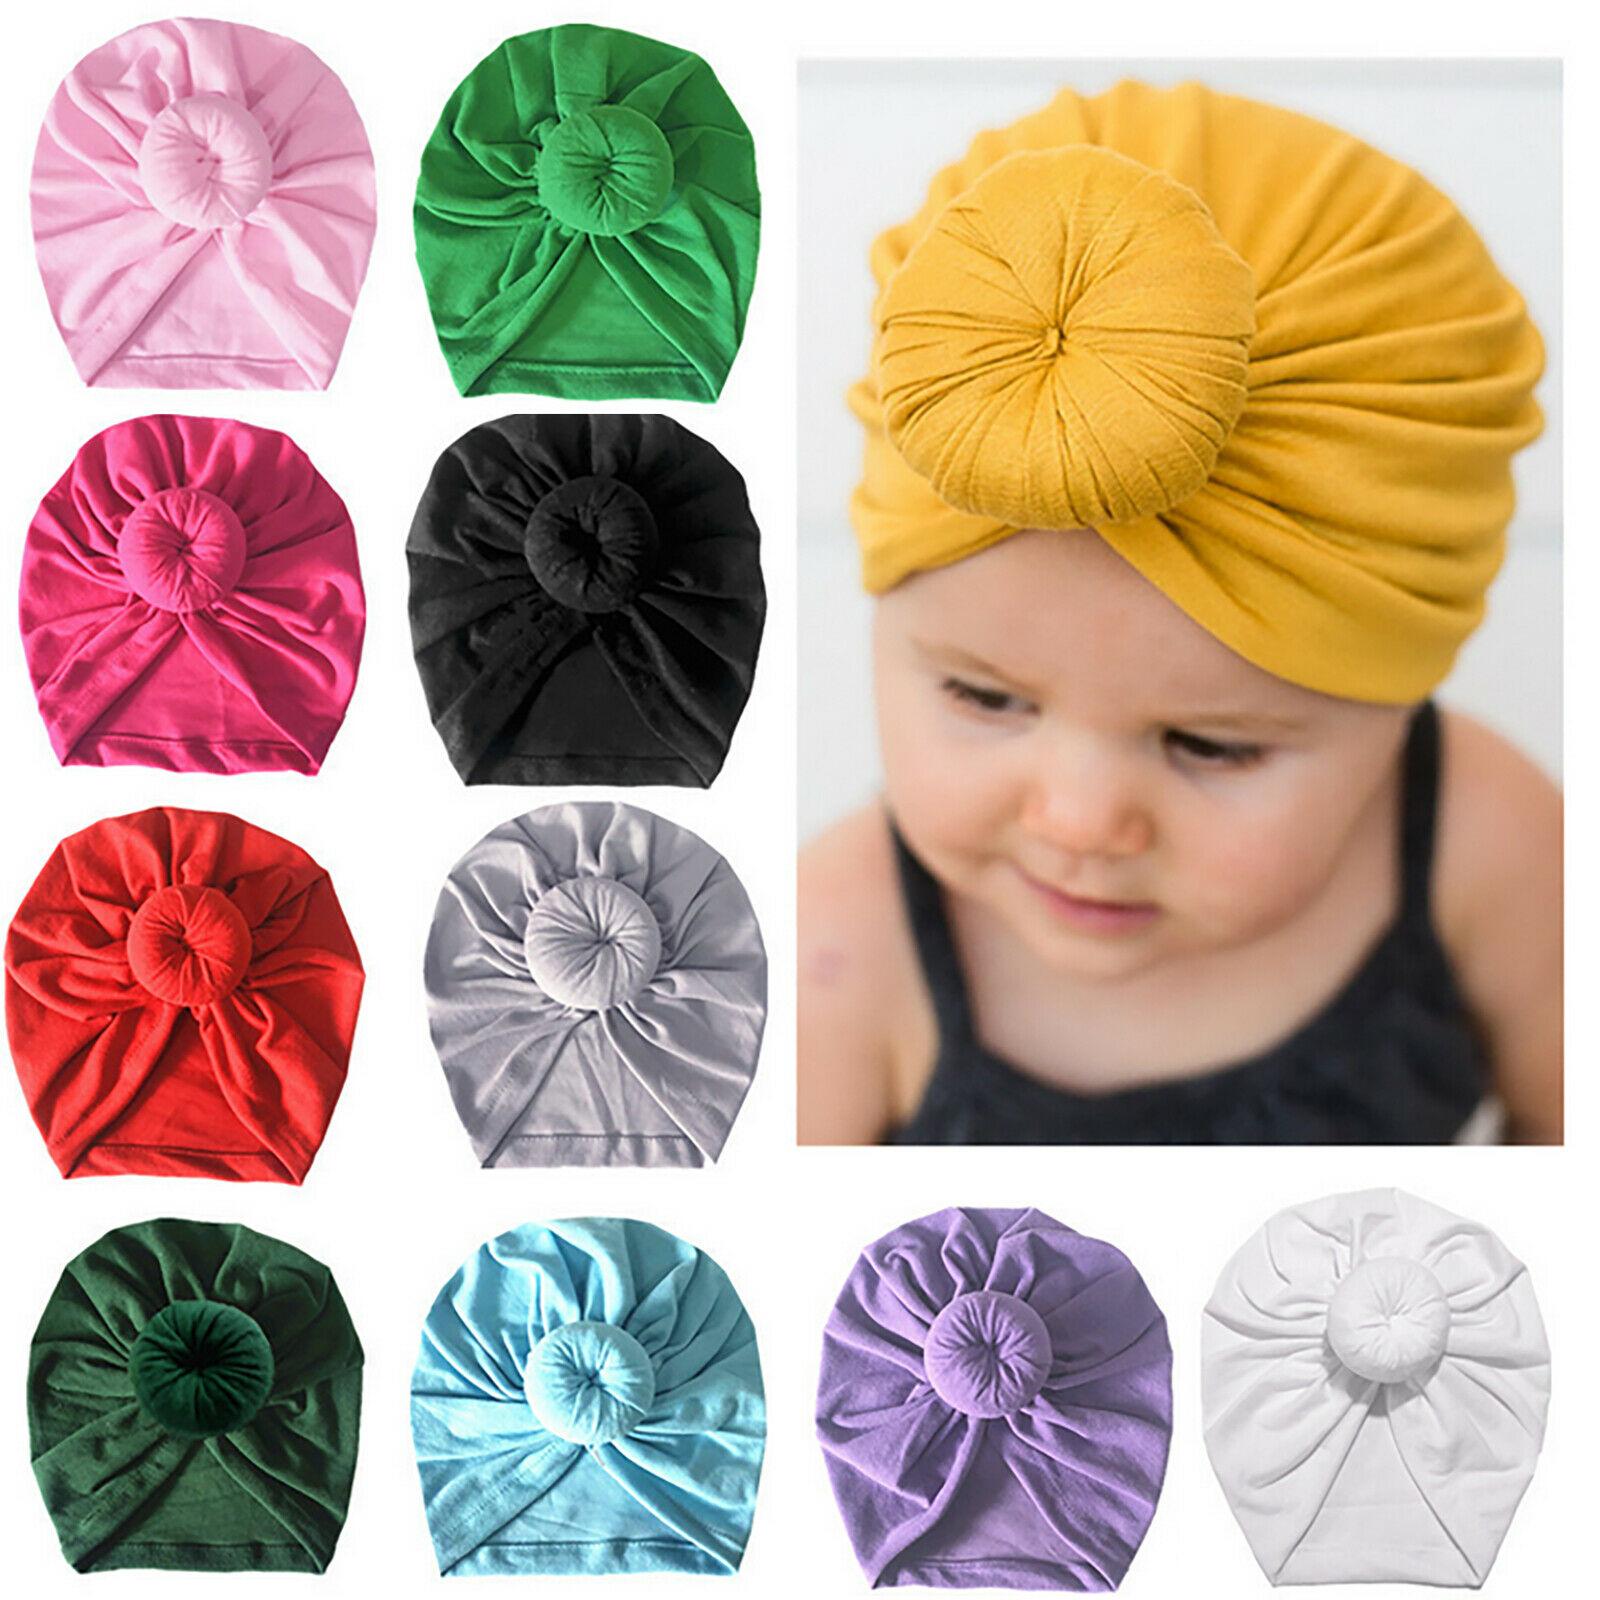 Infant Kids Newborn Baby Turban Knotted Head Wrap Headbands India Hats Beanie Cotton blend Hair Cap Children Girl Boy Head band